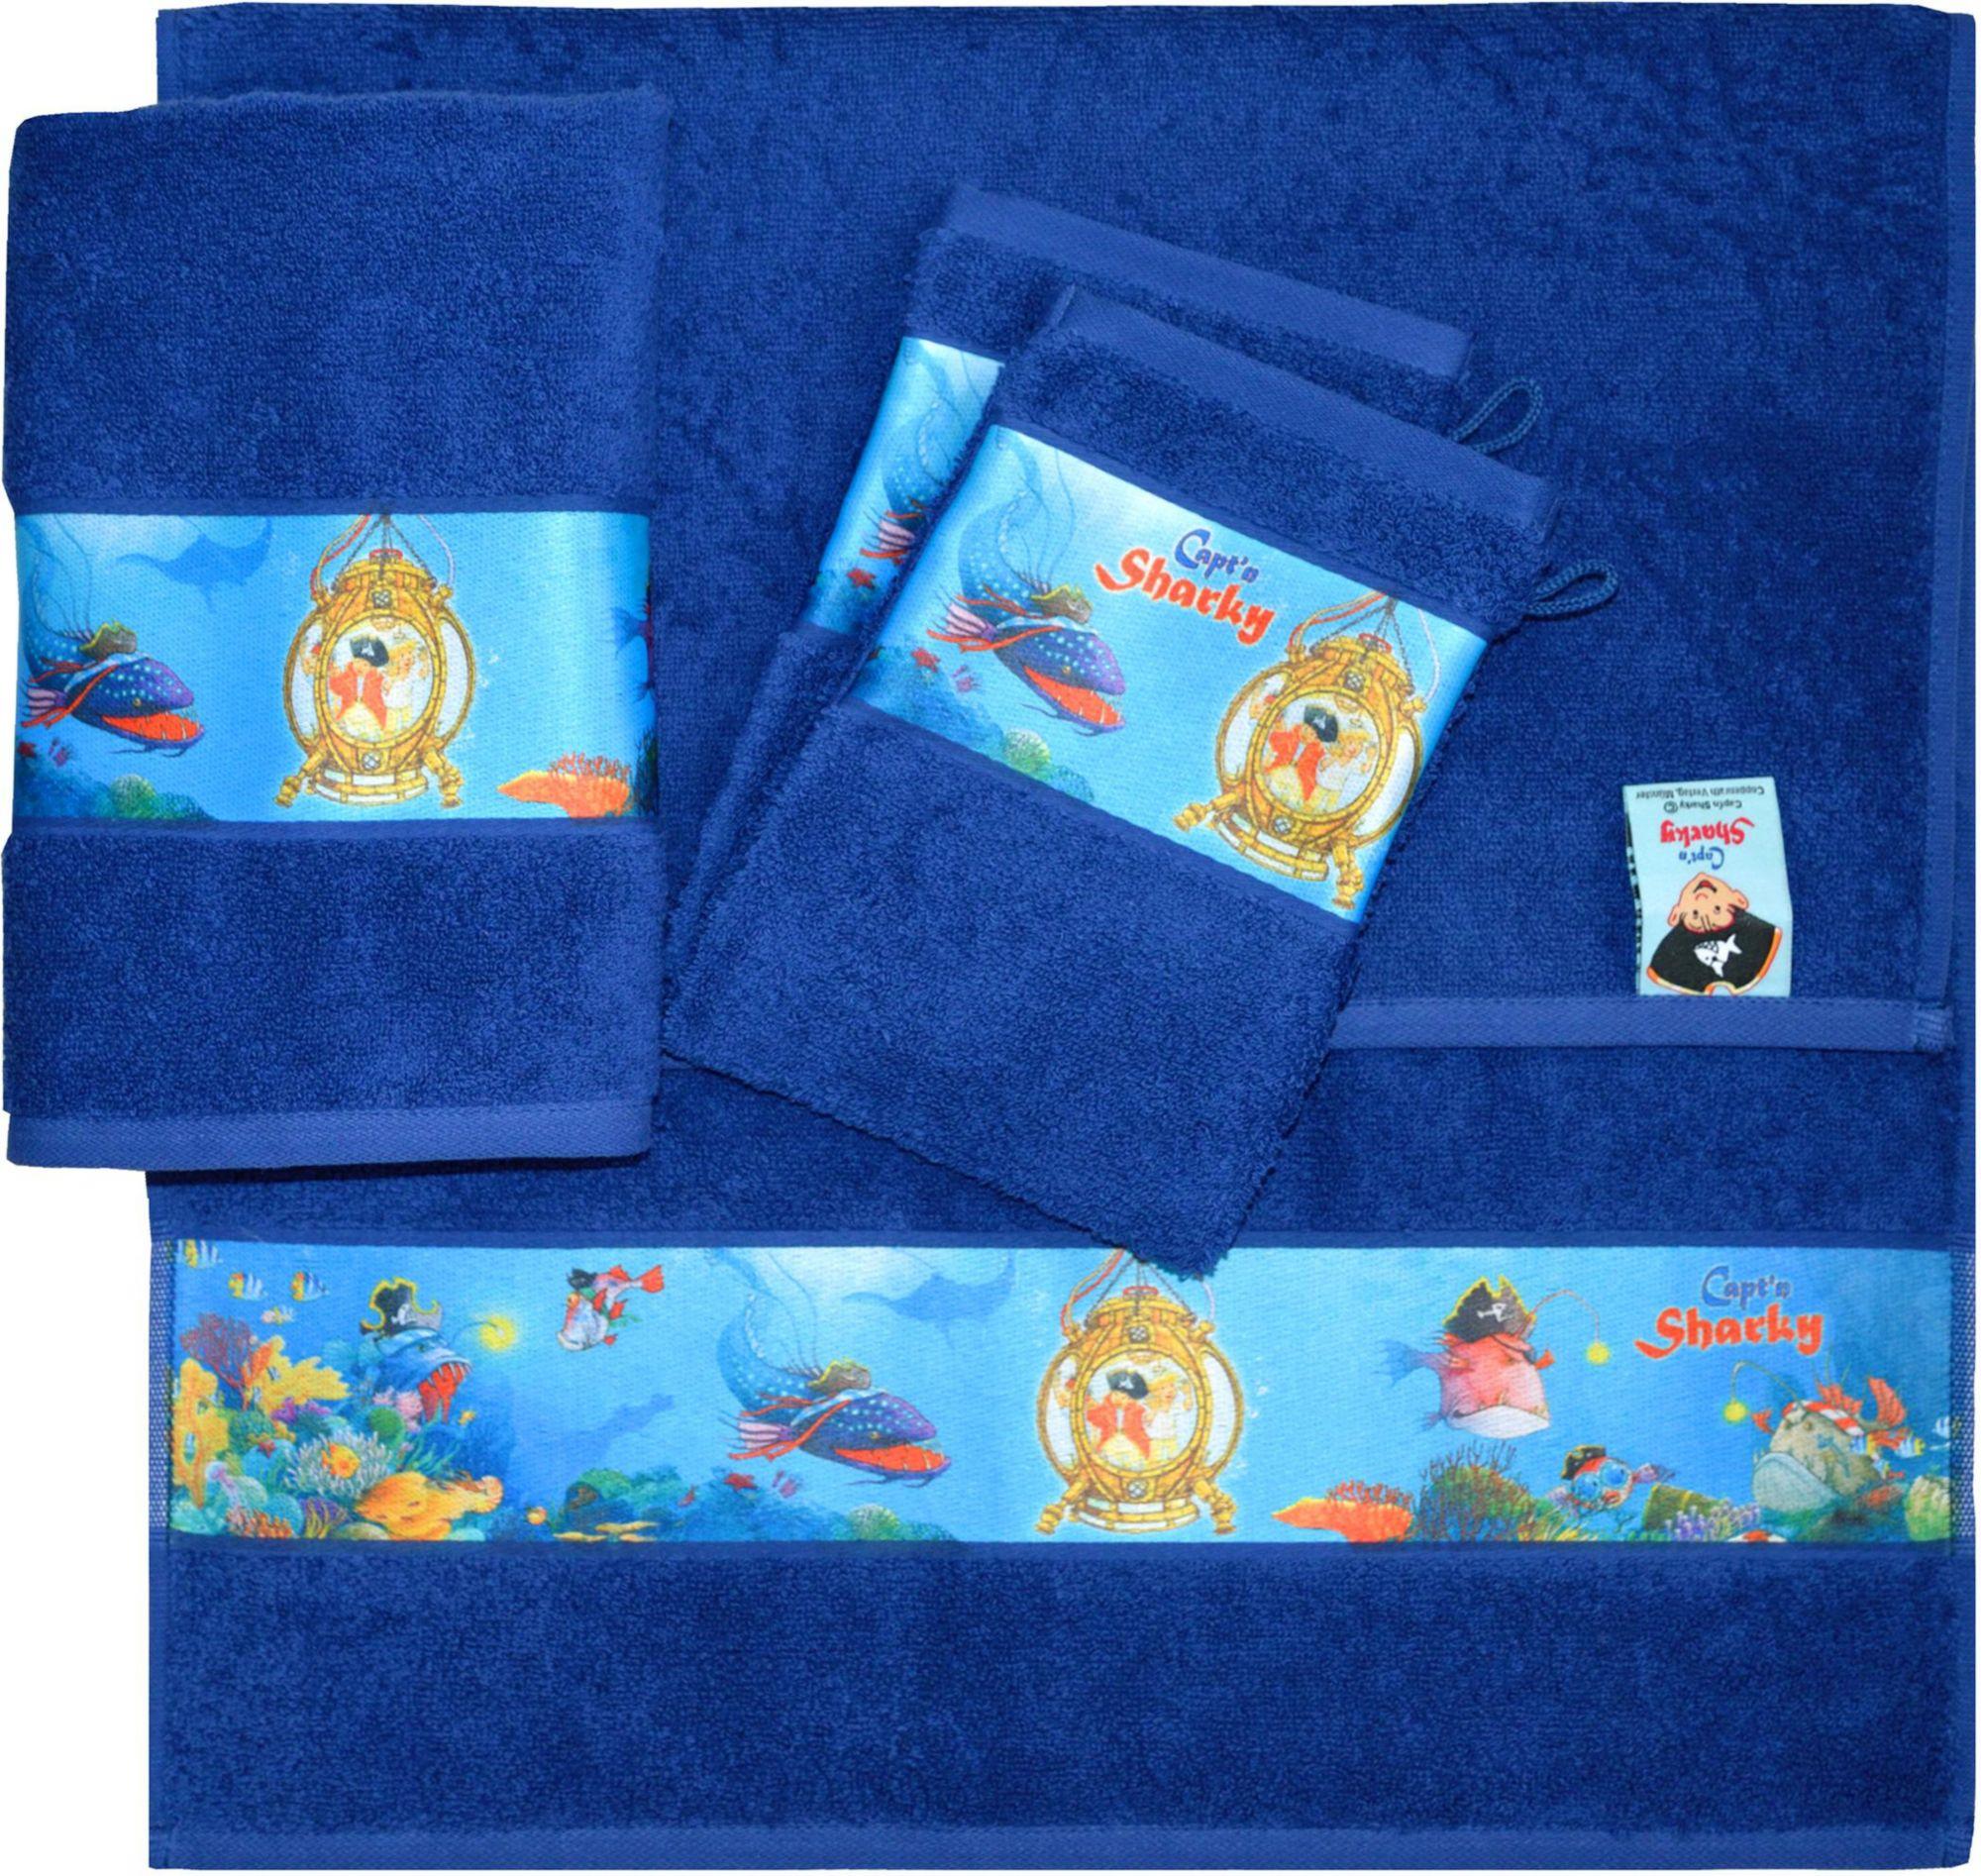 CAPTN SHARKY Handtuch Set, Capt`n Sharky, »Sharky«, mit Meeres Motiven